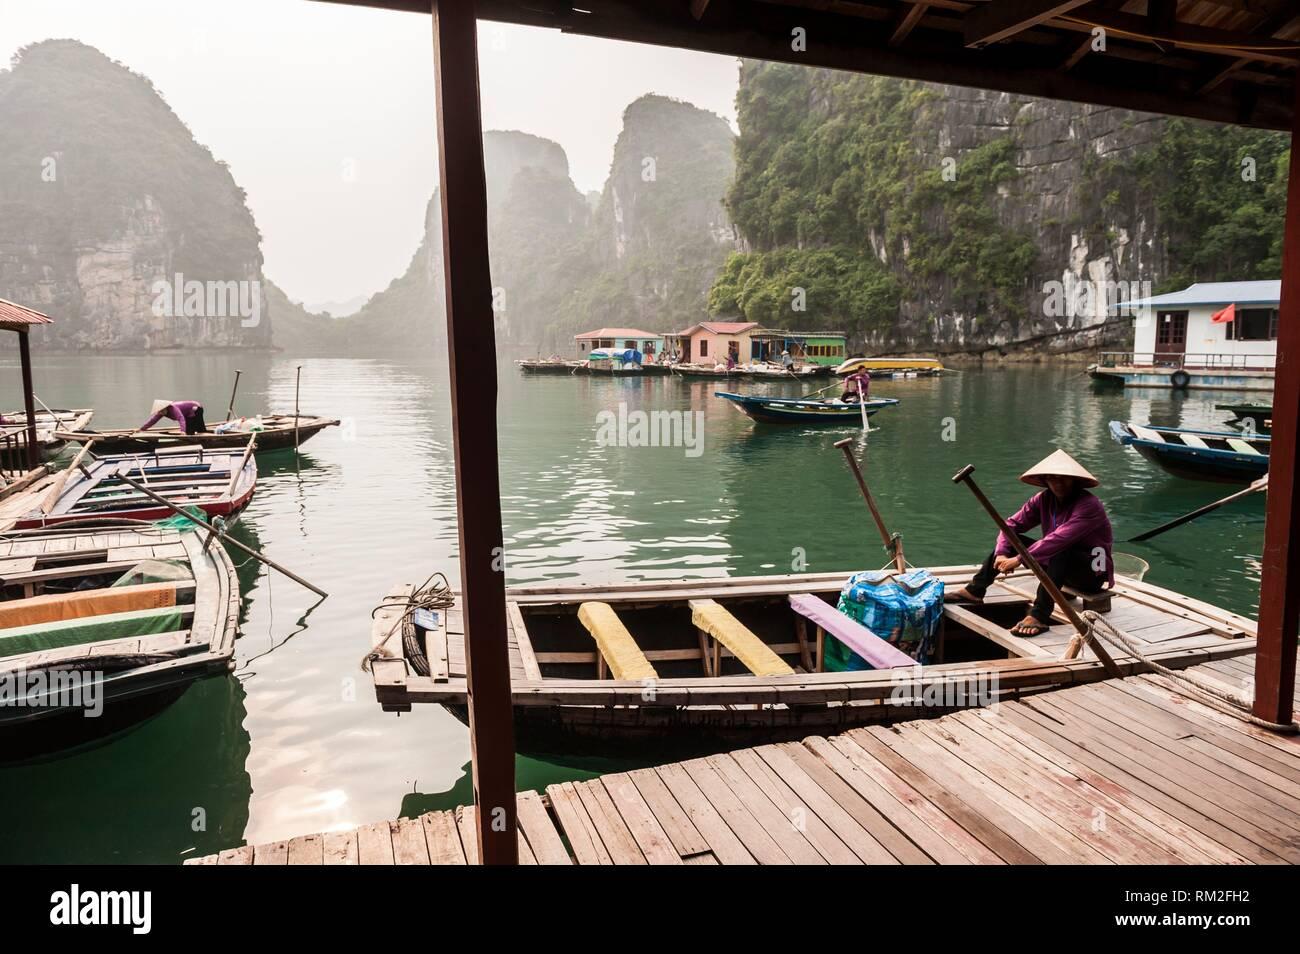 Vietnamese boatman in the karst landscape of Ha Long Bay, Quang Ninh Province, Vietnam. Ha Long Bay is a UNESCO World Heritage Site. Stock Photo